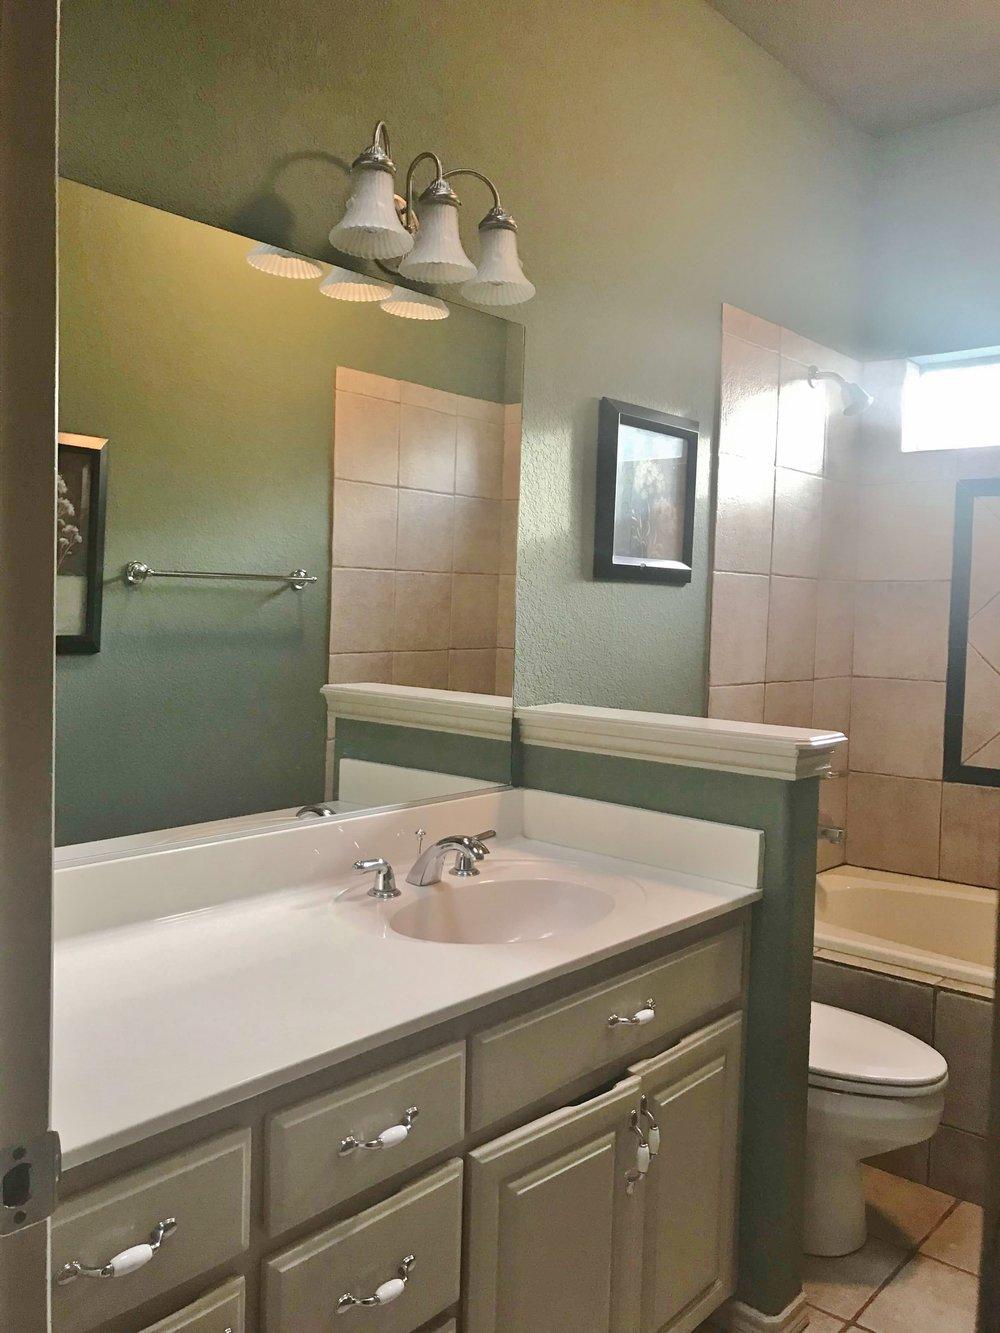 6 X 10 Bathroom Designs Youtube 35 X 6 Bathroom Design Cldverdun